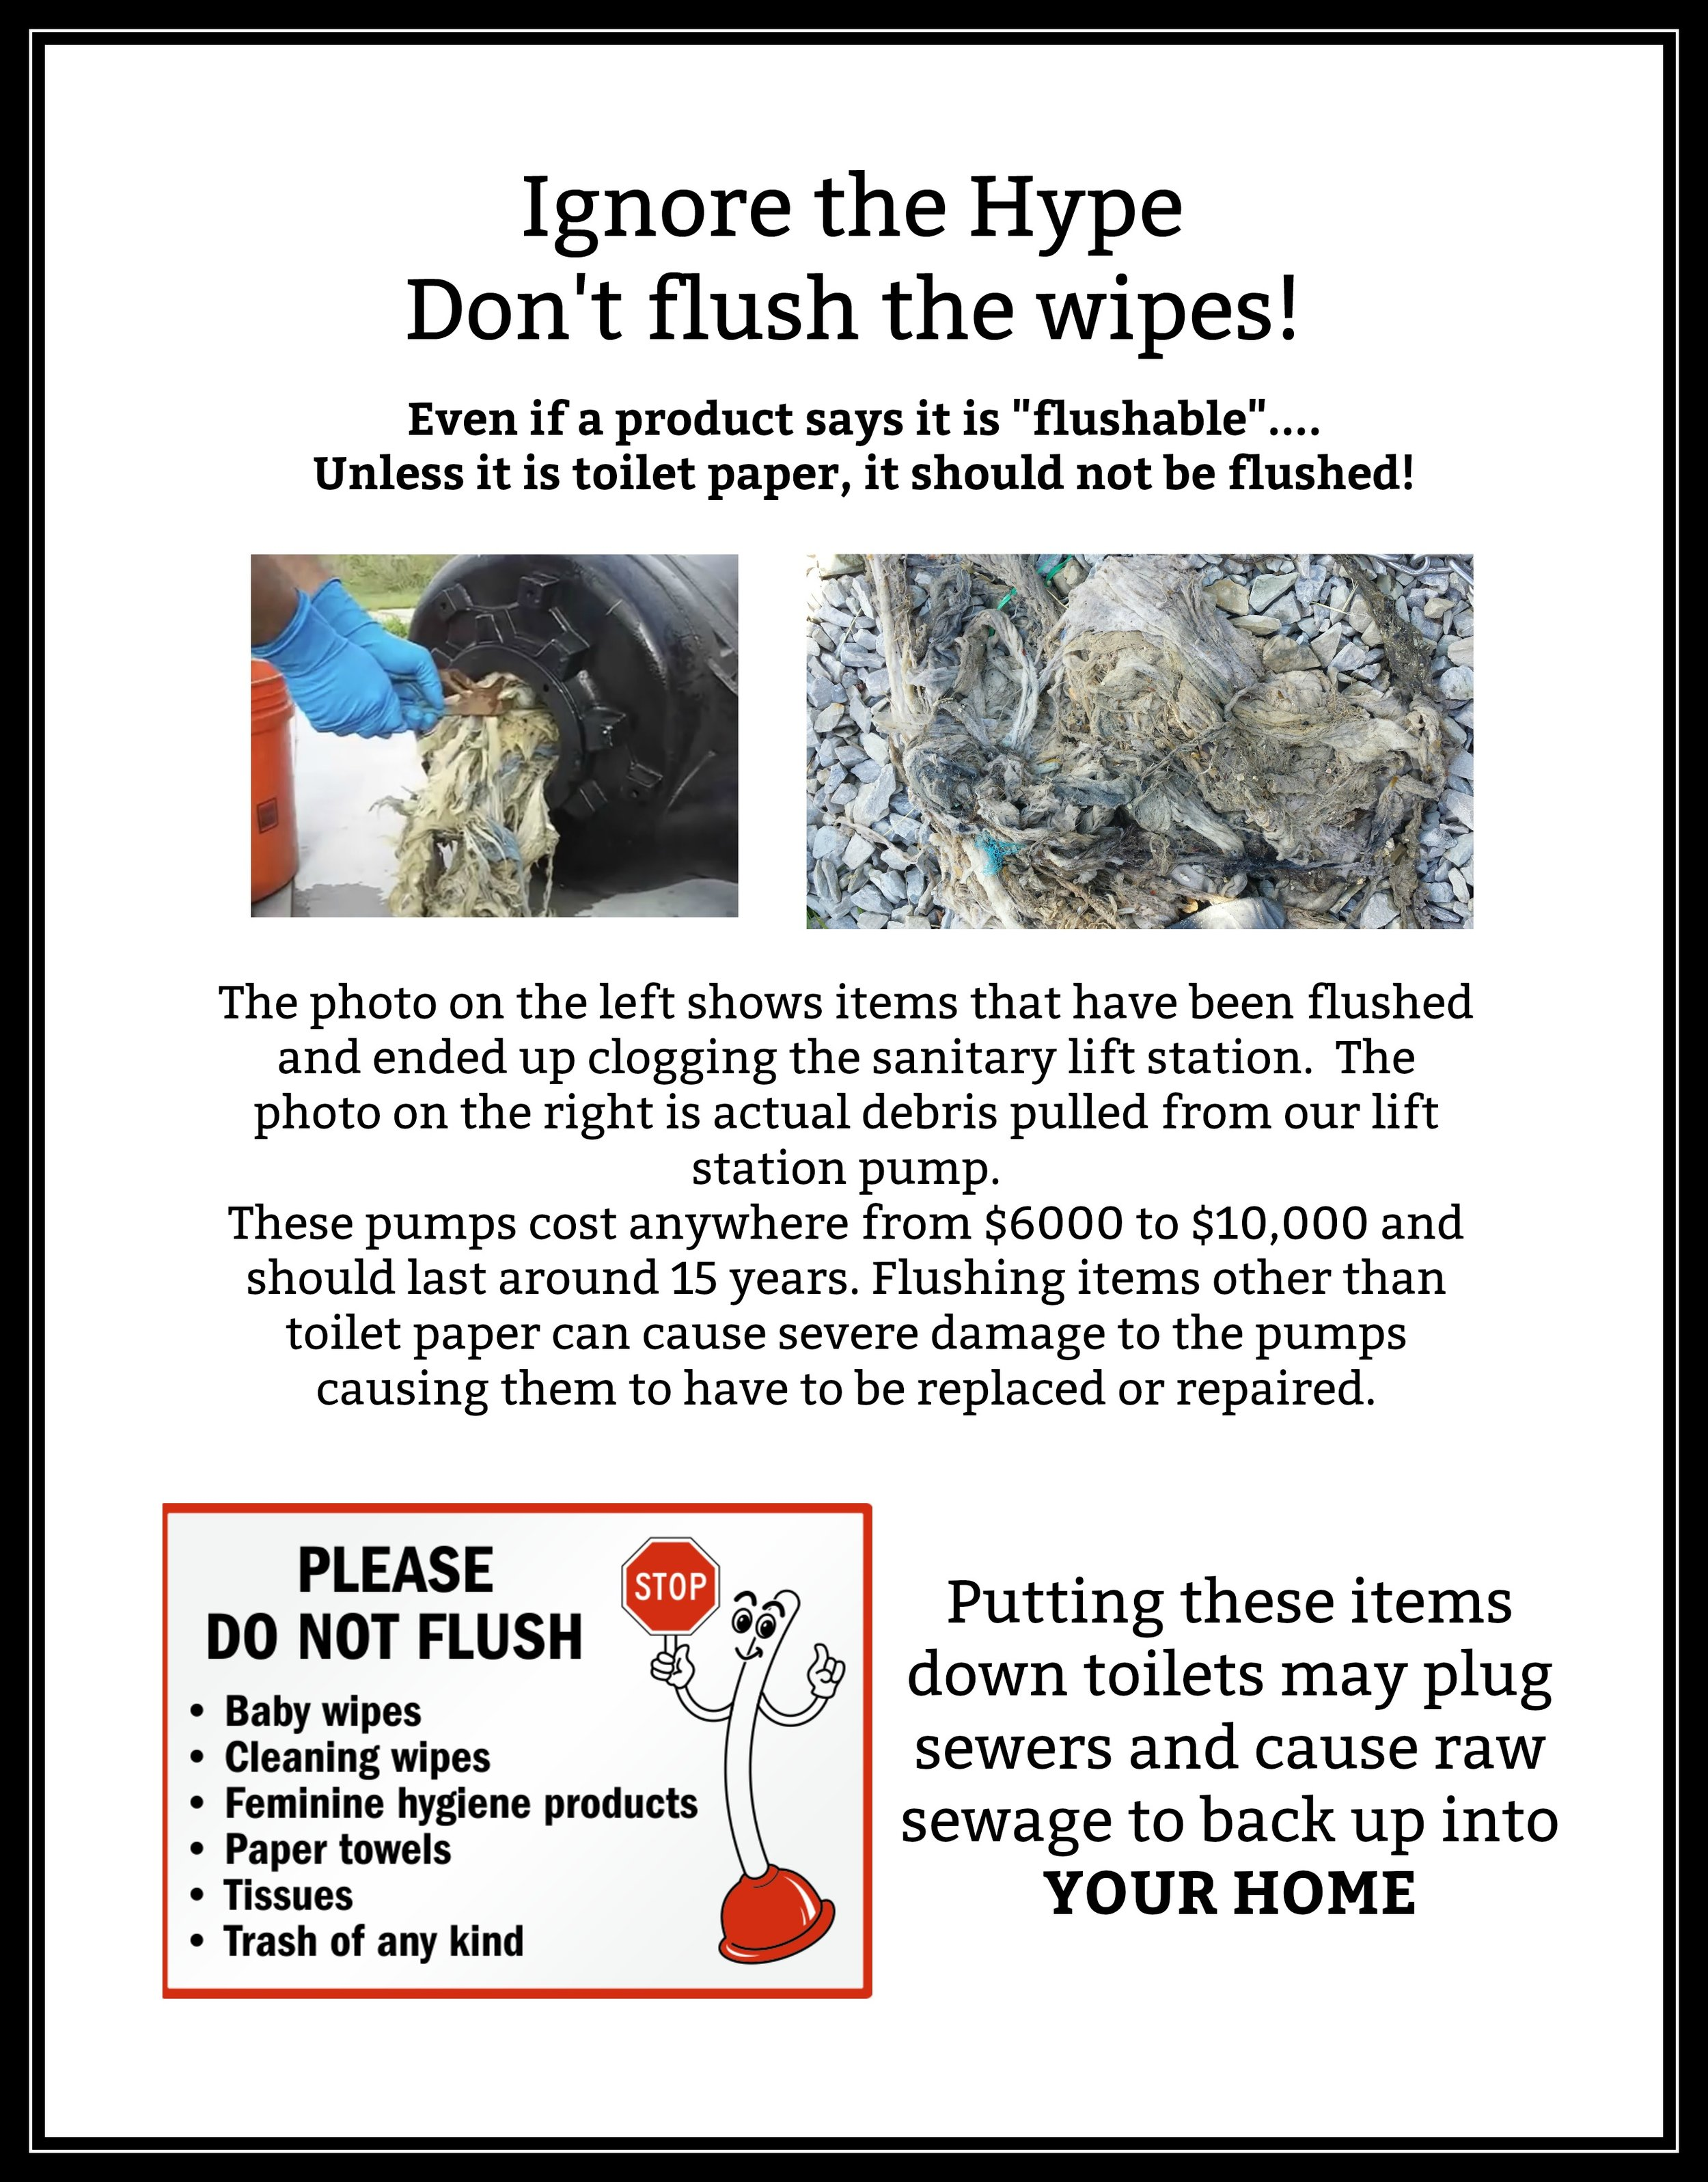 Don't flush wipes with frame.jpg